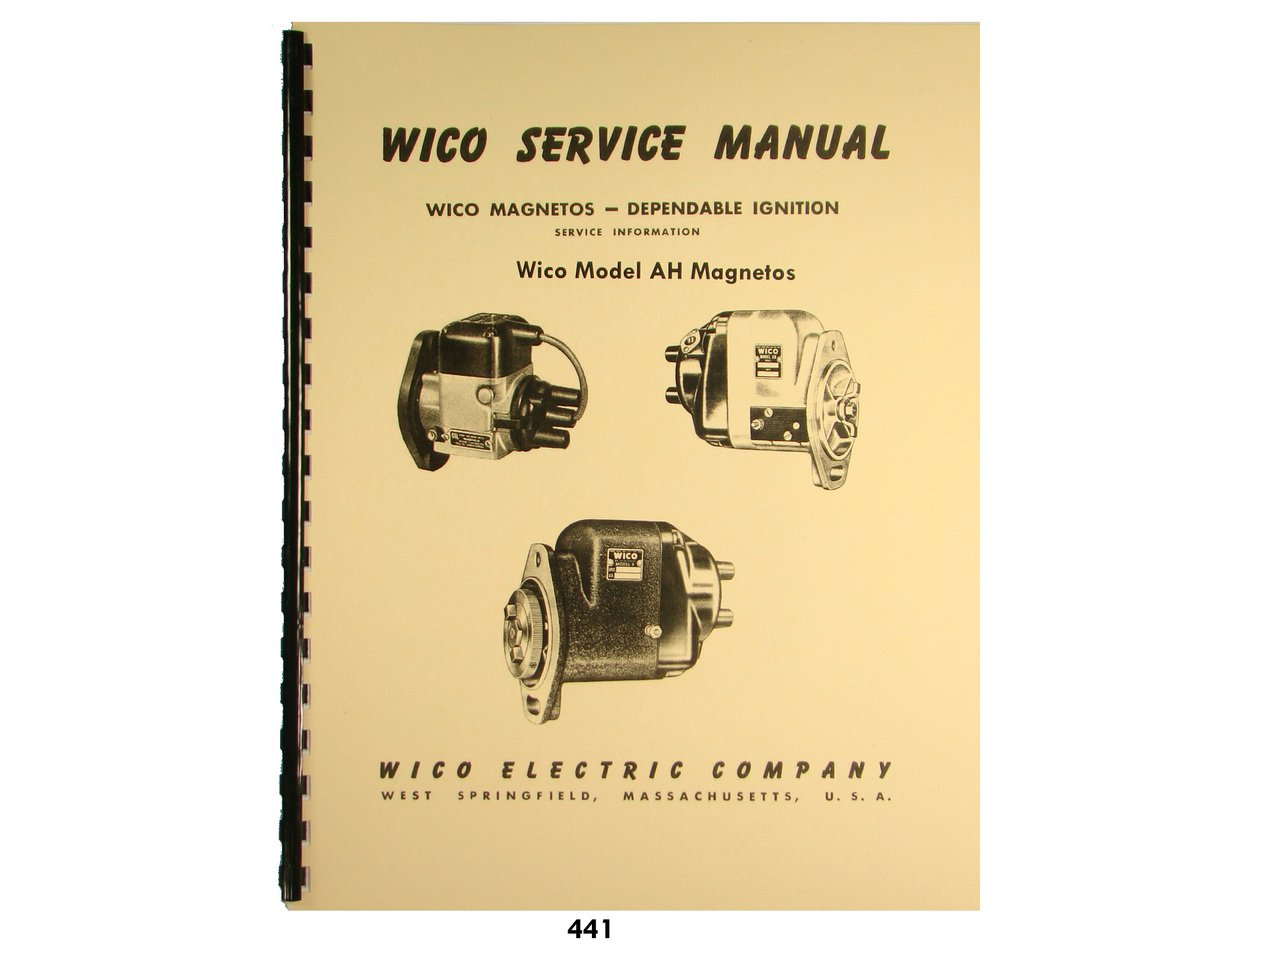 Wico Service & Parts Manual for AH Magneto: Wico Magnetos: Amazon.com: Books